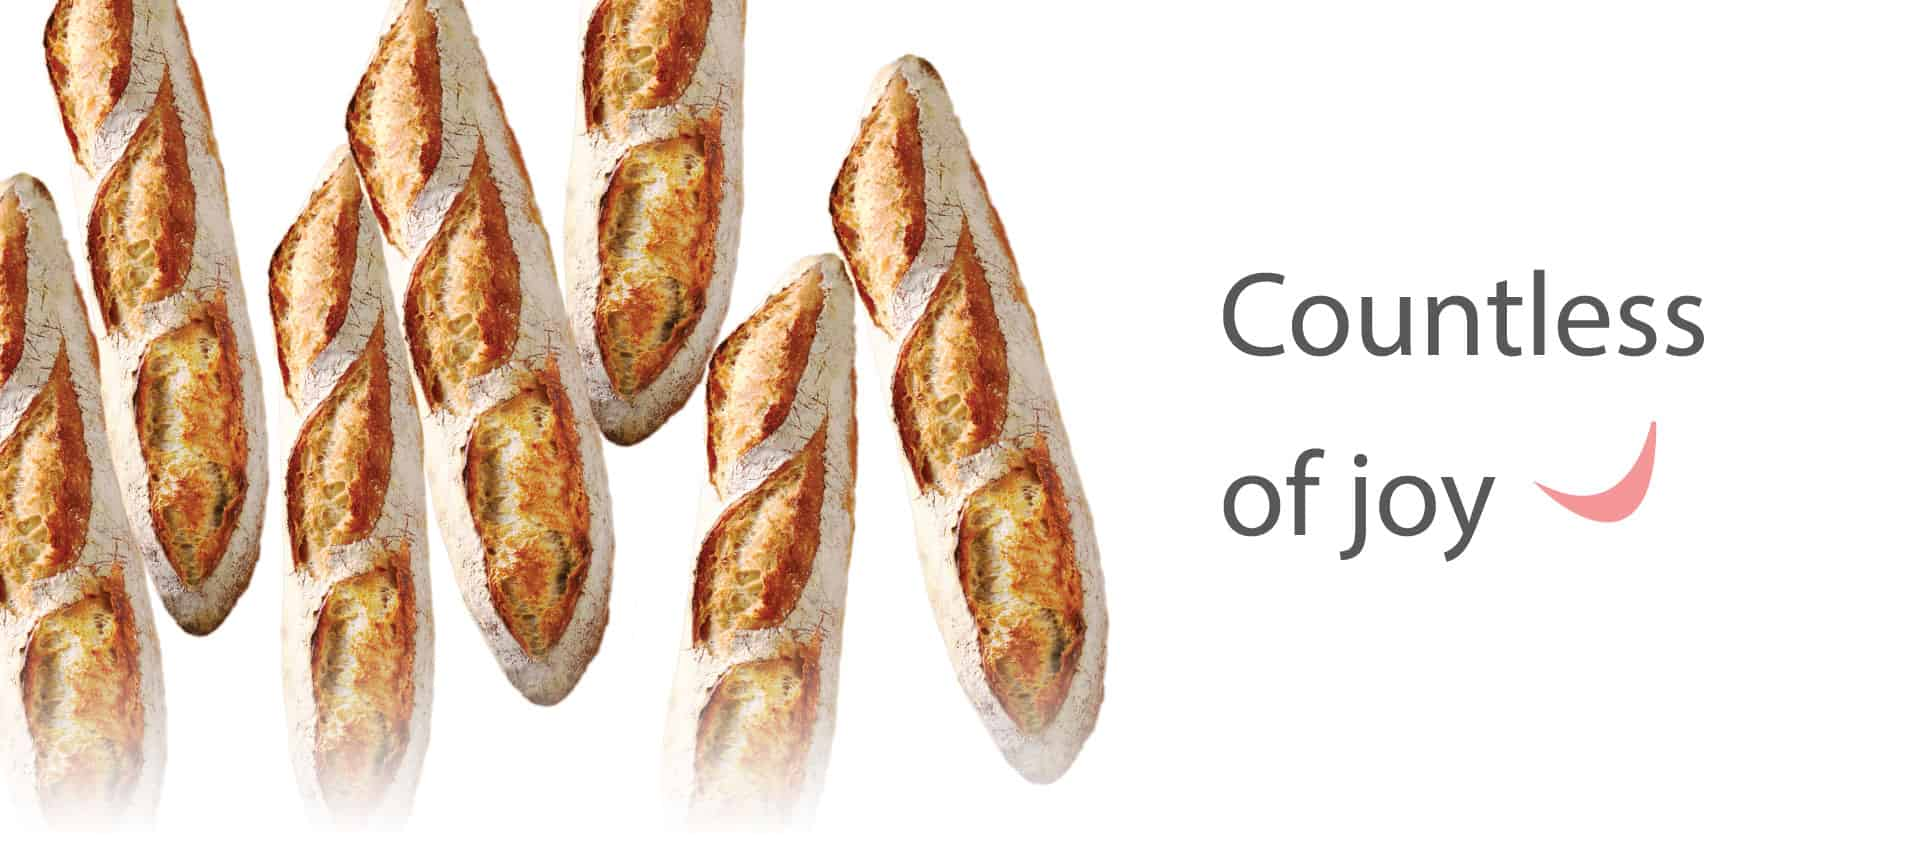 bread-cloud-studio-1-anniversary-facebook-banner-2